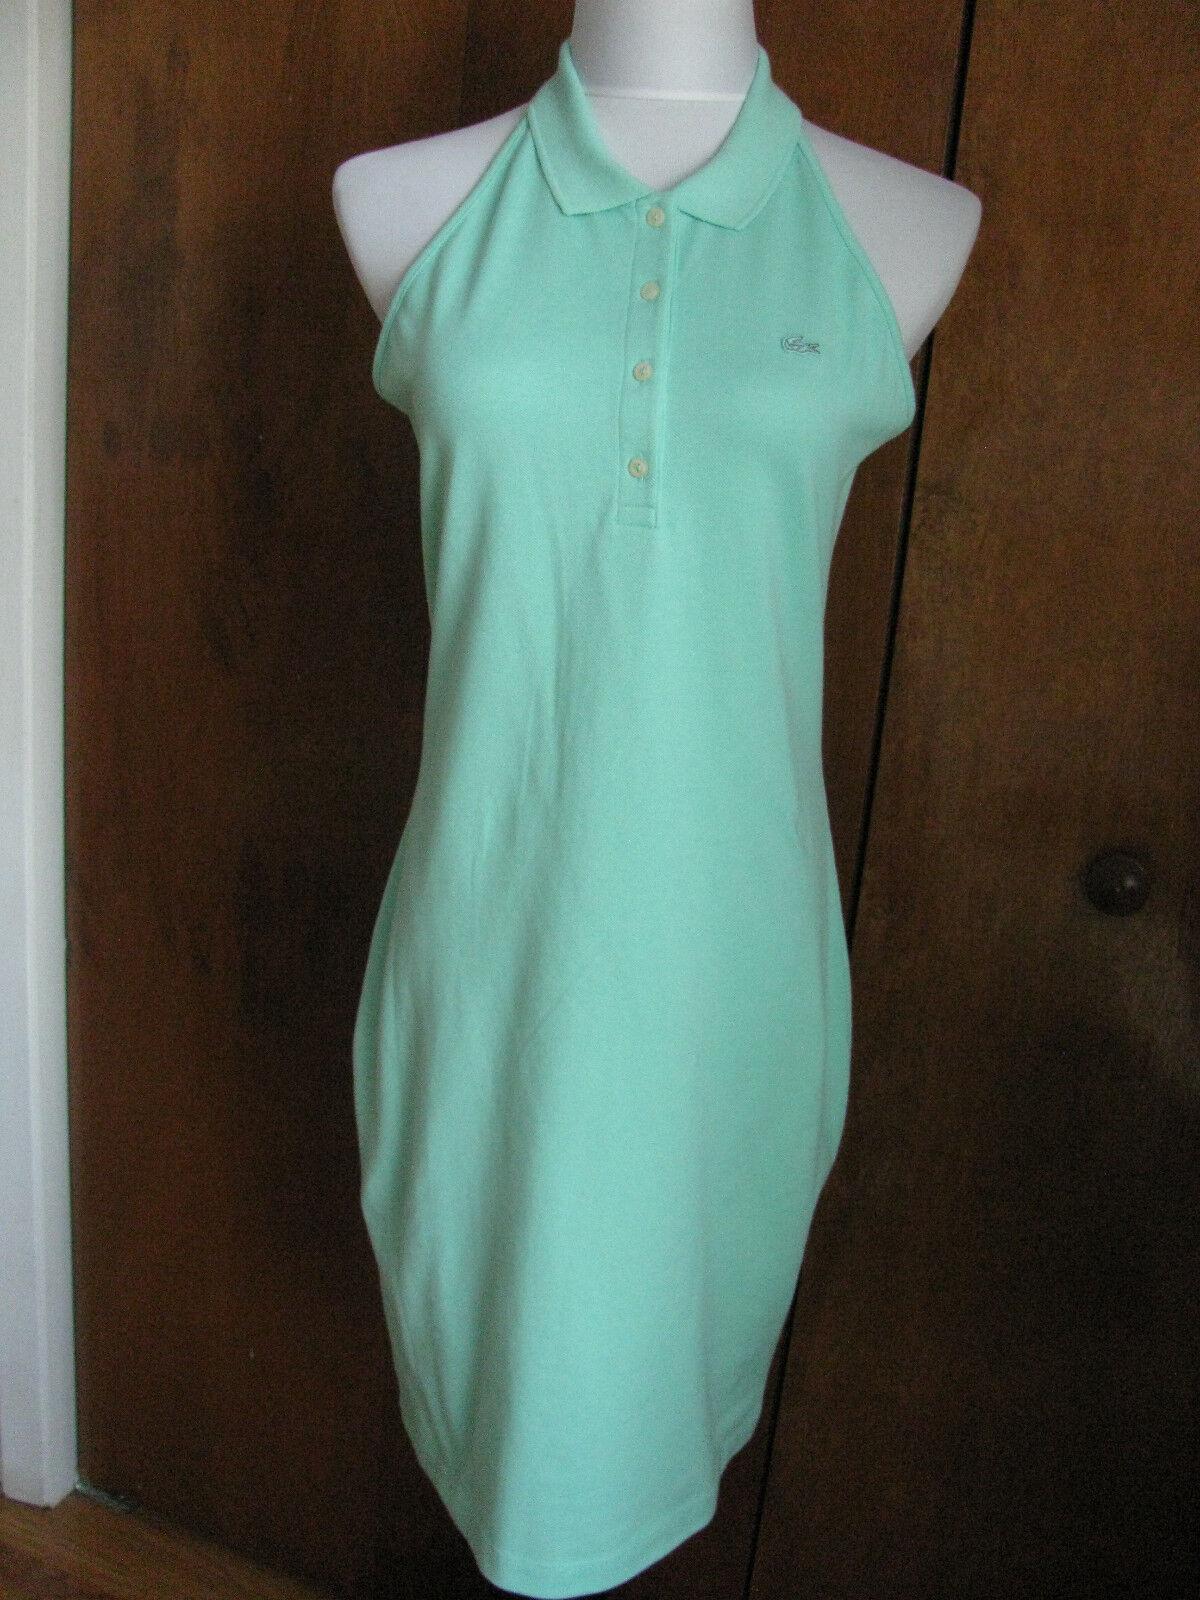 Lacoste women's green cotton halter dress size US2 Euro34 US10 Euro42 NWT